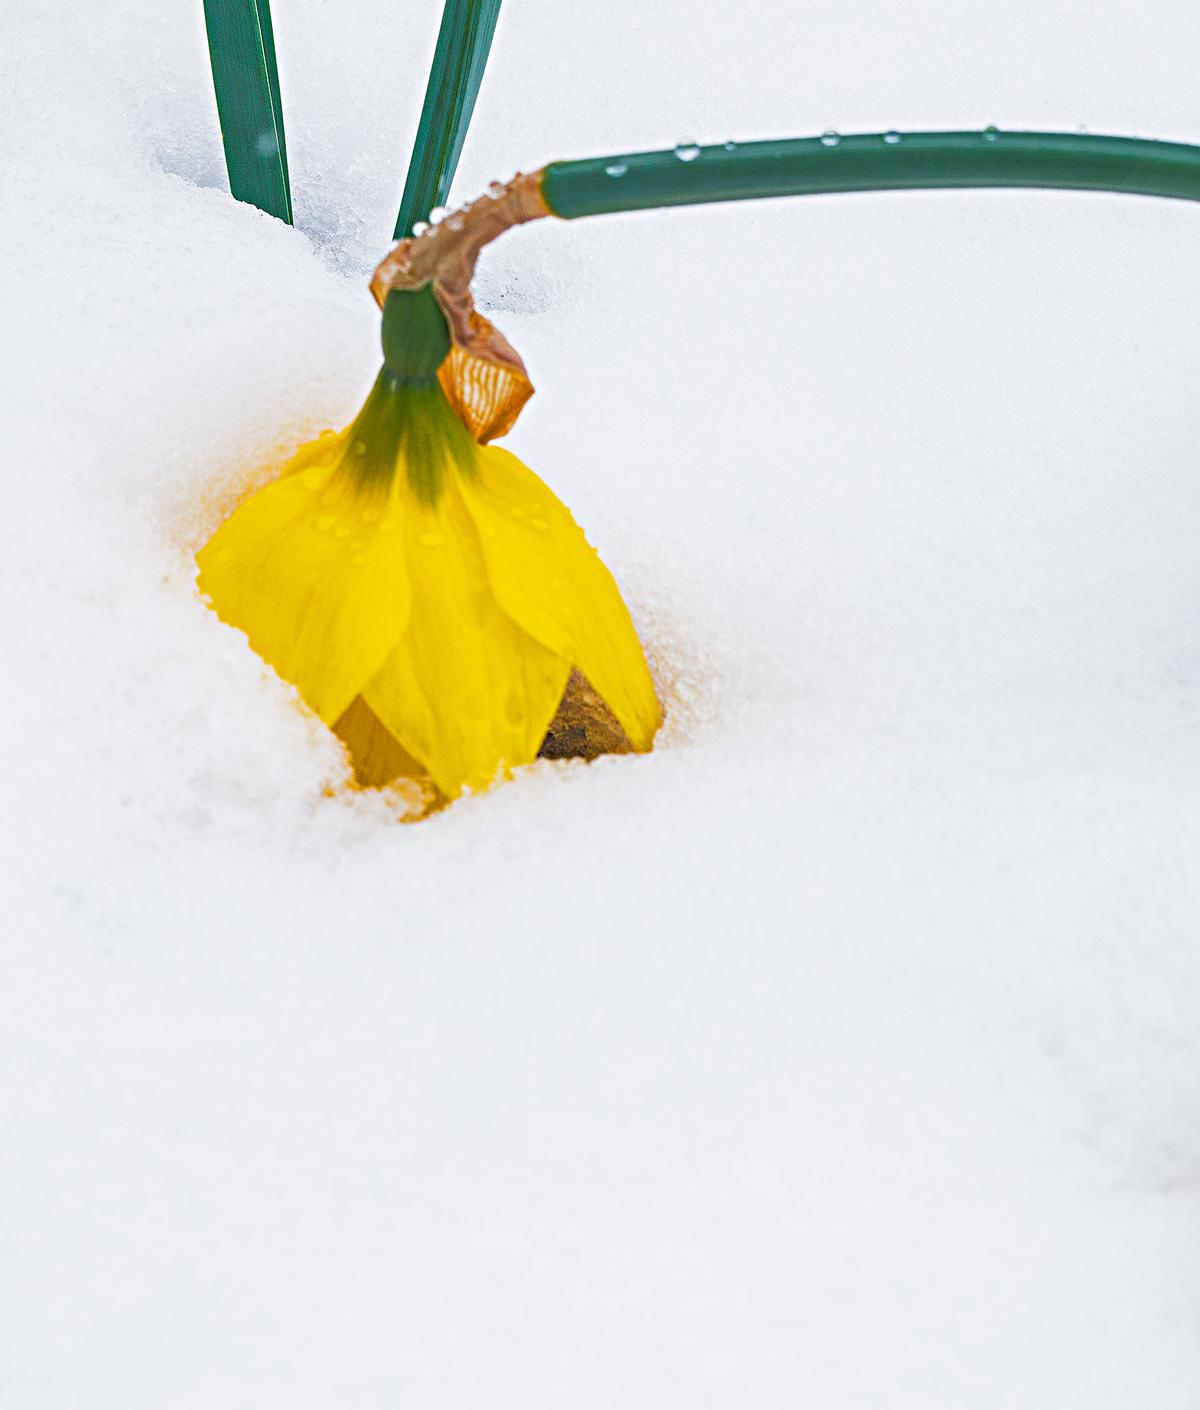 xeriscape, Colorado springs, Colorado, daffodil. snowstorm, photo